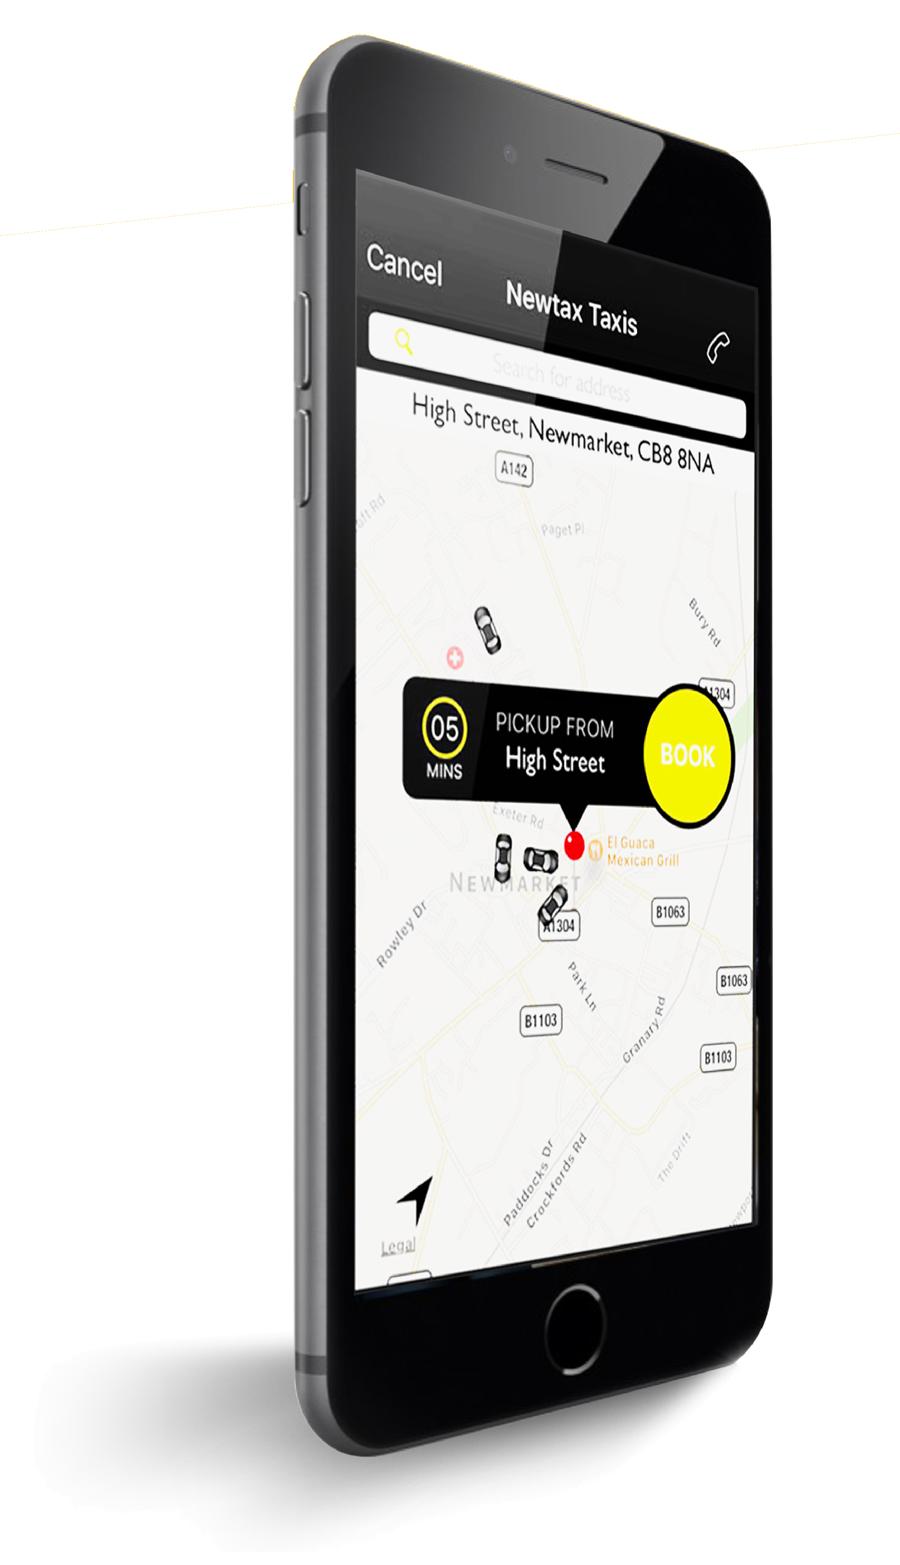 Newtax taxi mobile app